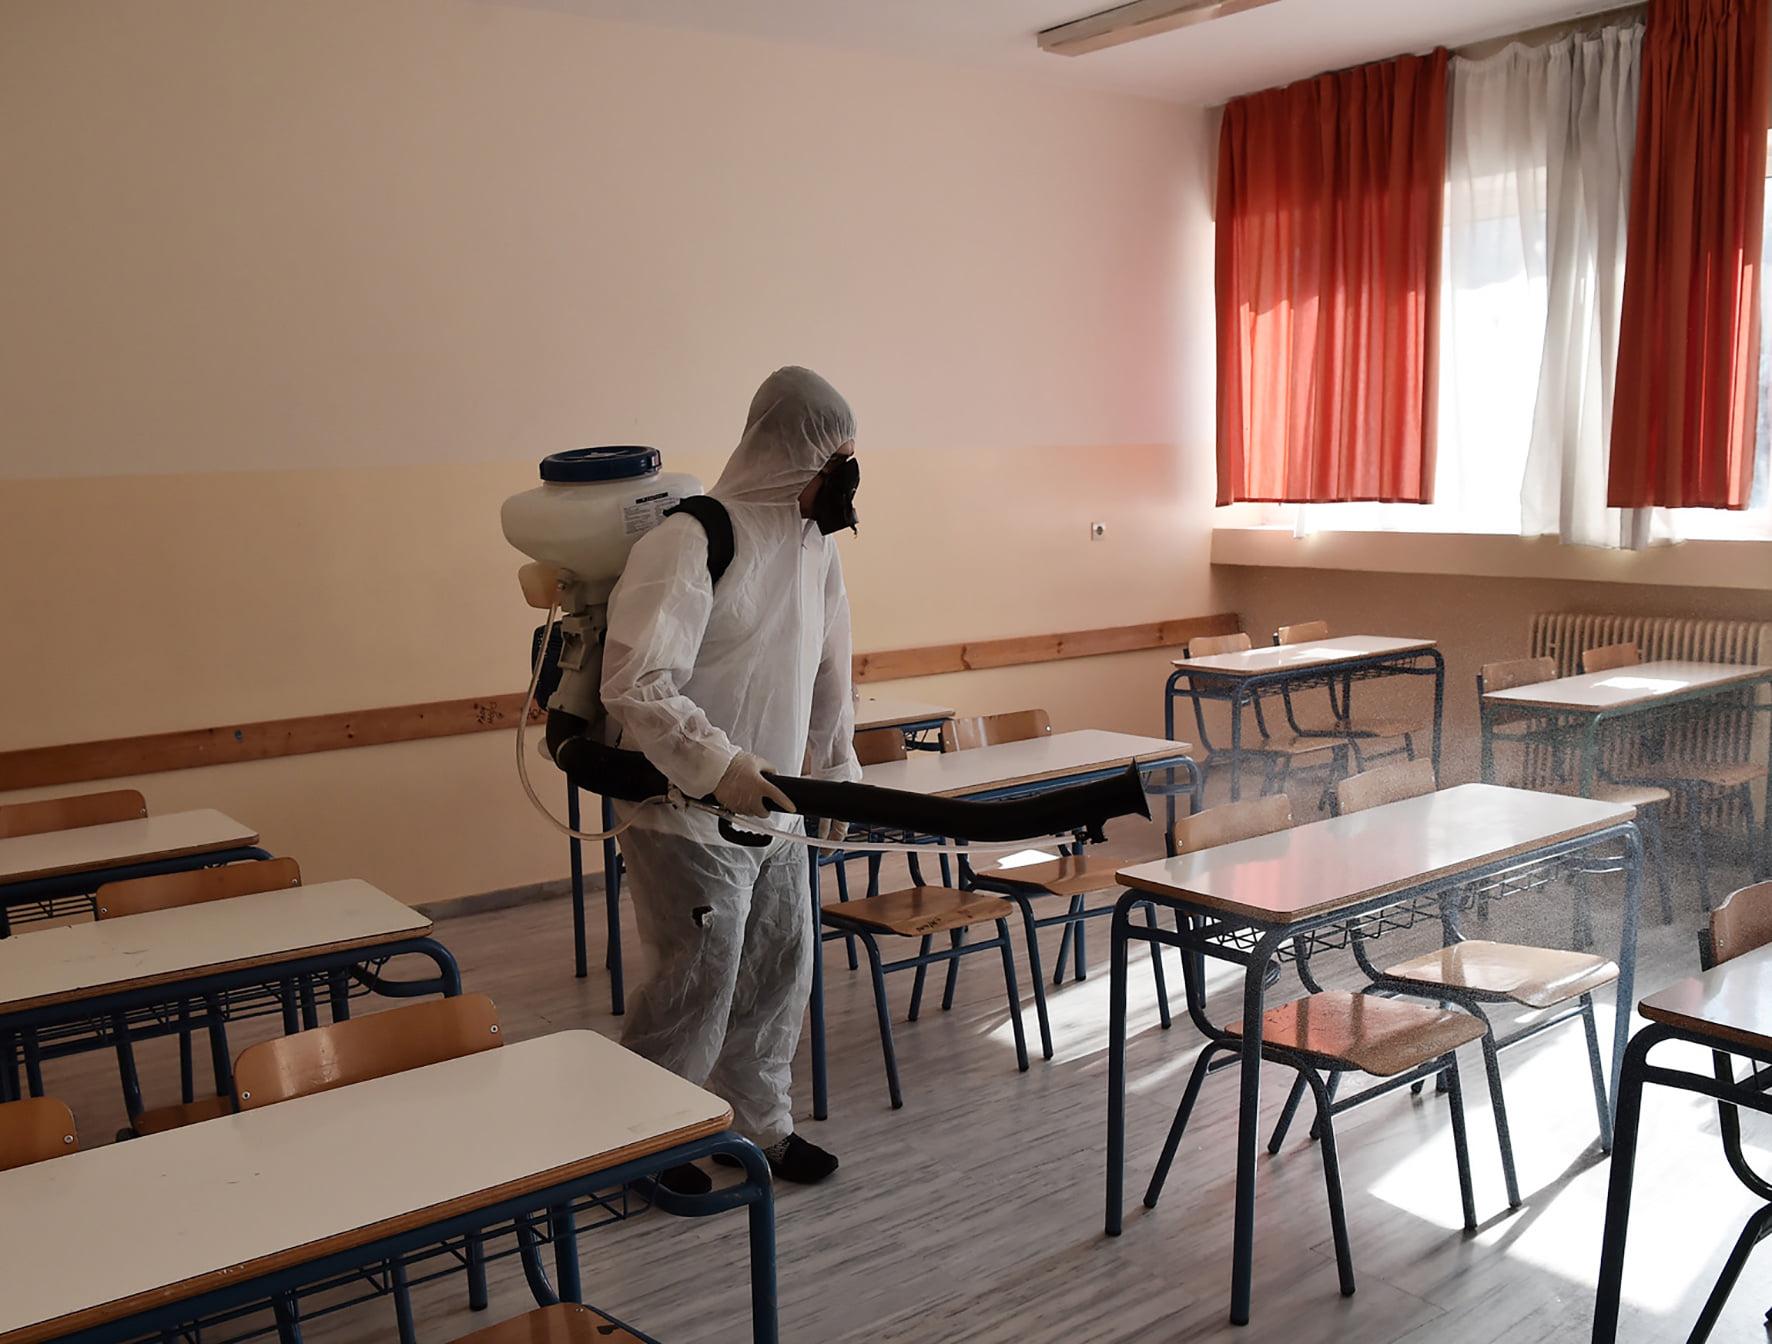 Kρούσμα σε μαθητή στο Γυμνάσιο Γαβαλούς